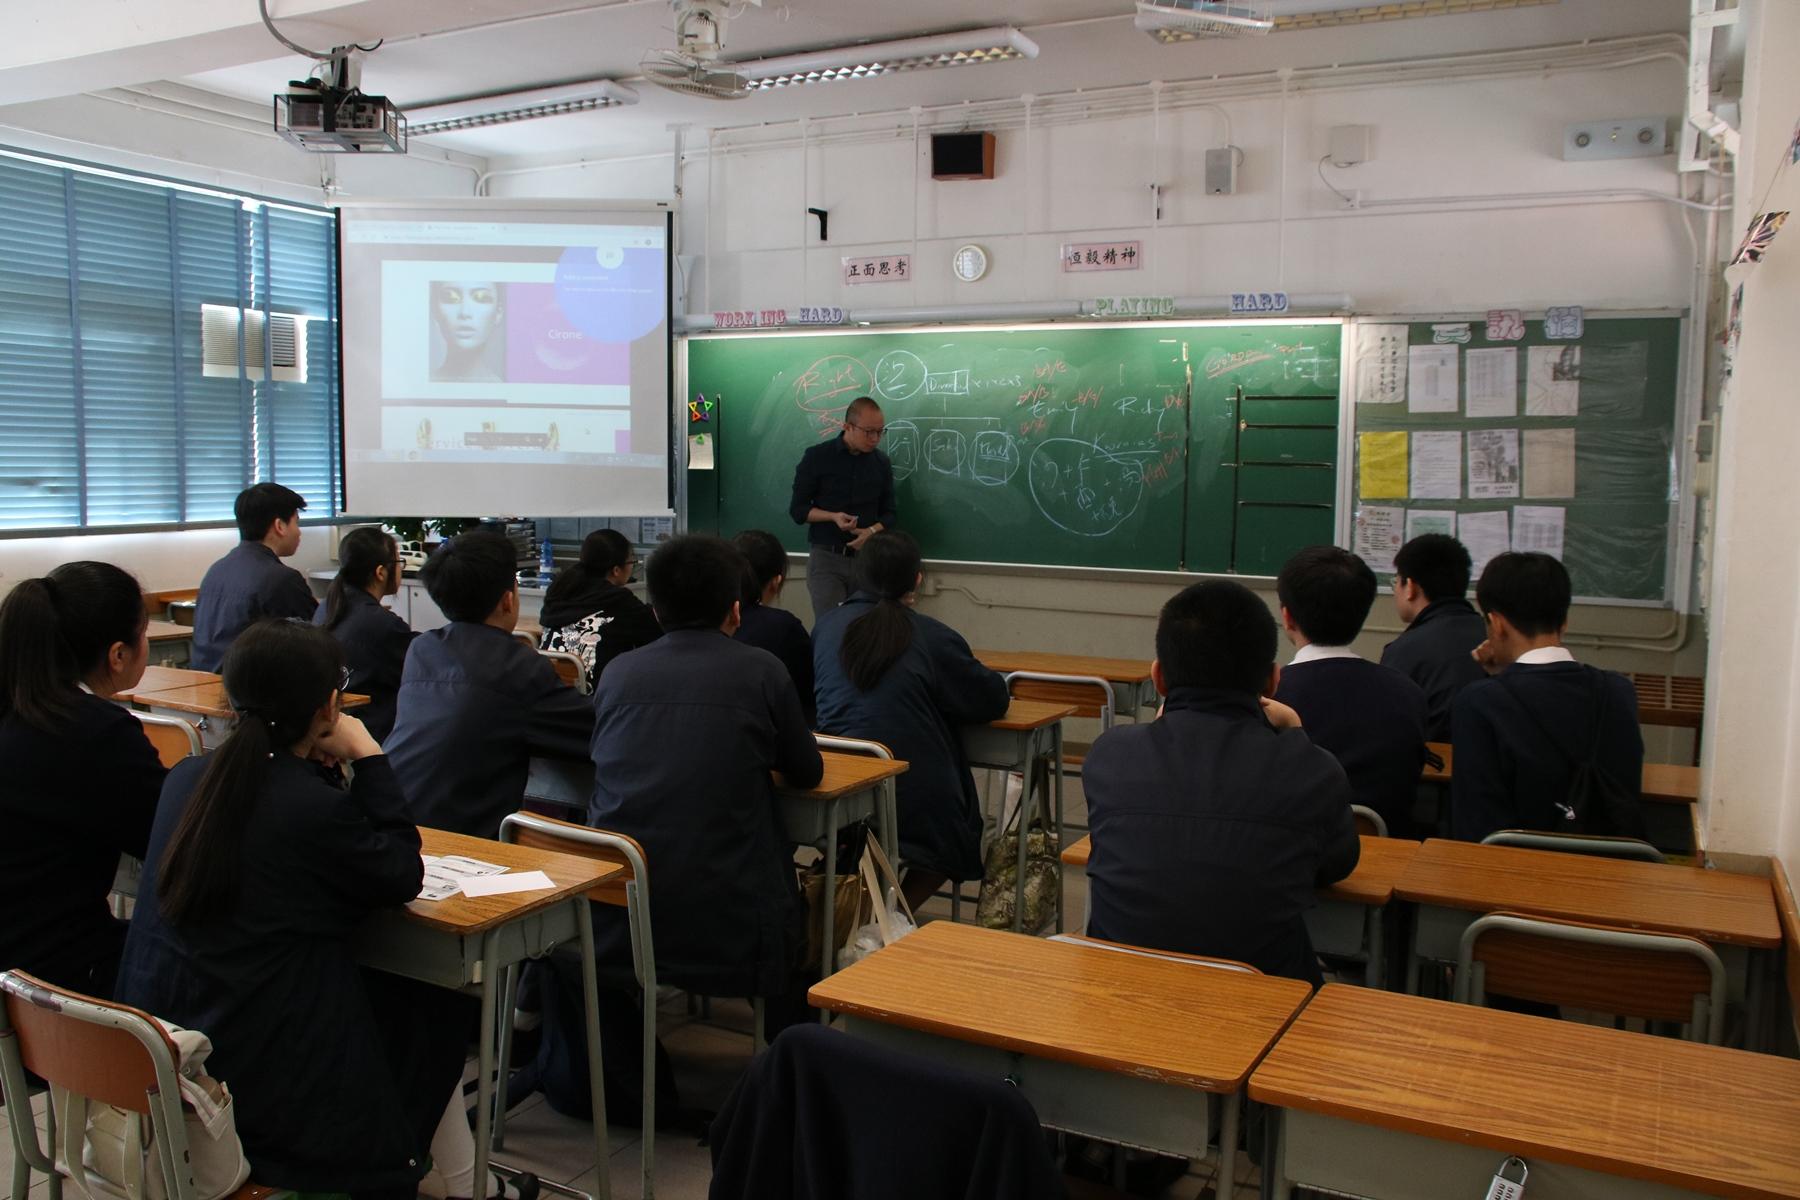 http://npc.edu.hk/sites/default/files/img_9737.jpg